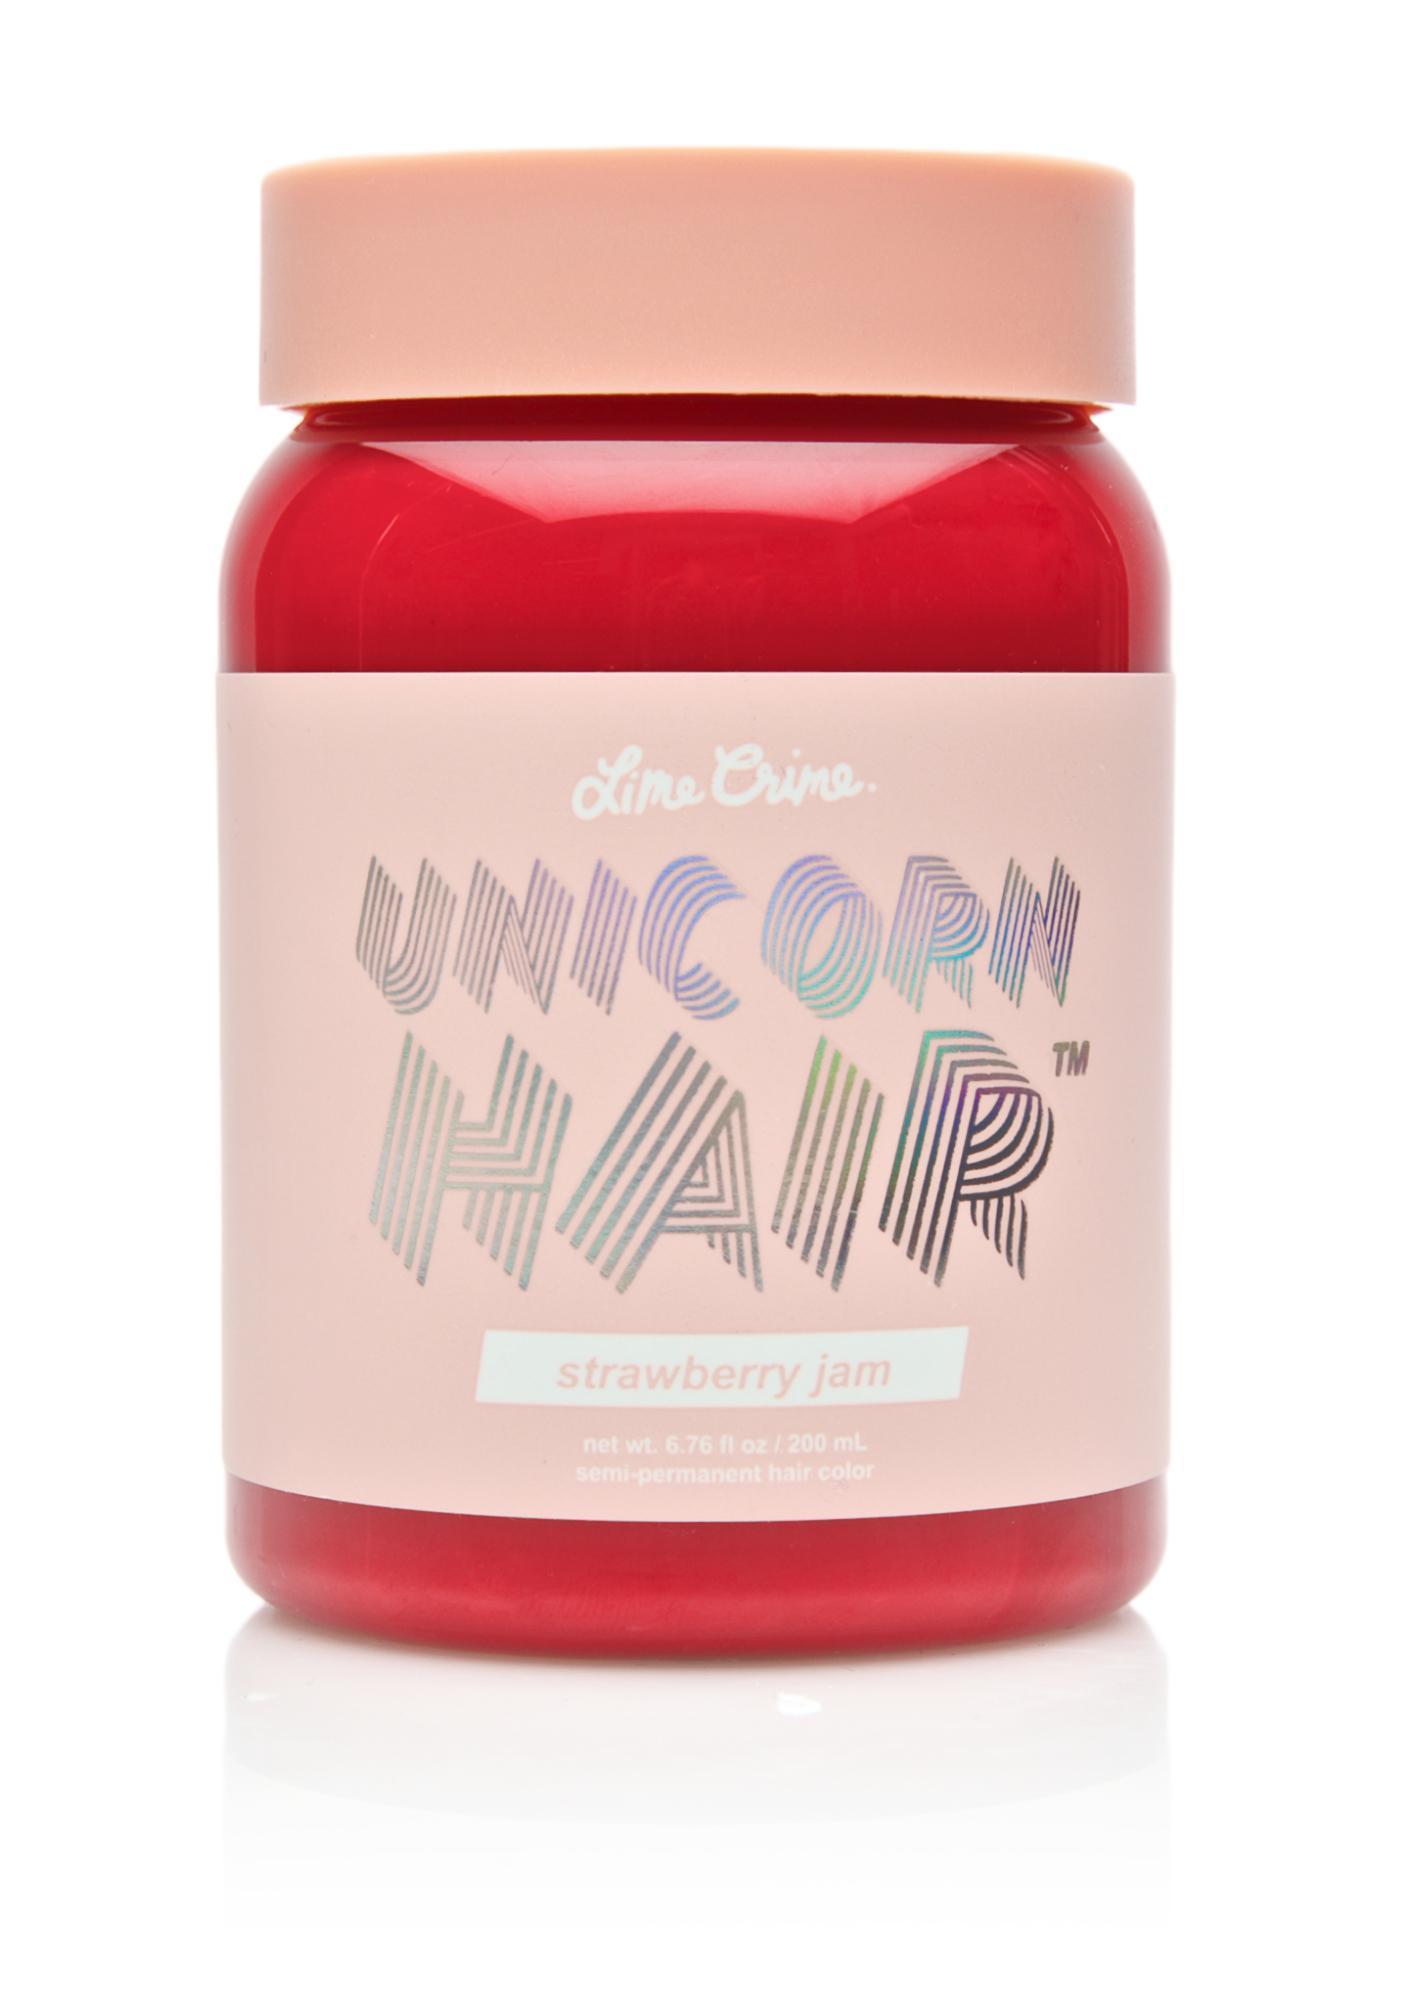 Lime Crime Strawberry Jam Unicorn Hair Dye